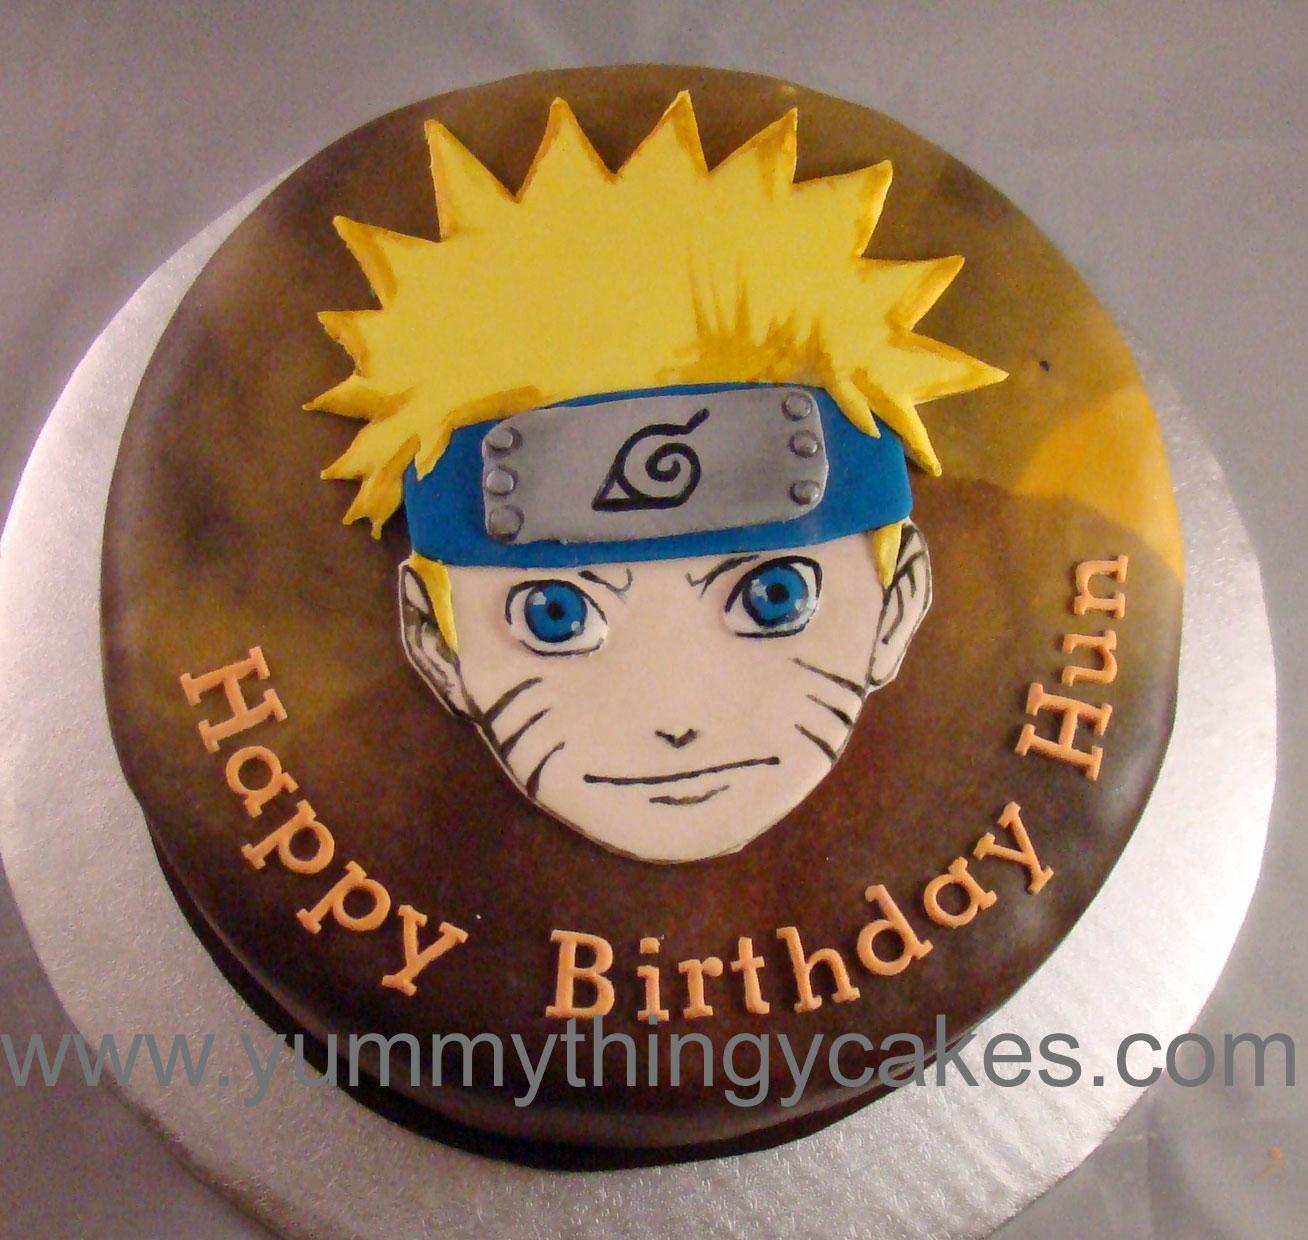 Yummy Thingy: Naruto?